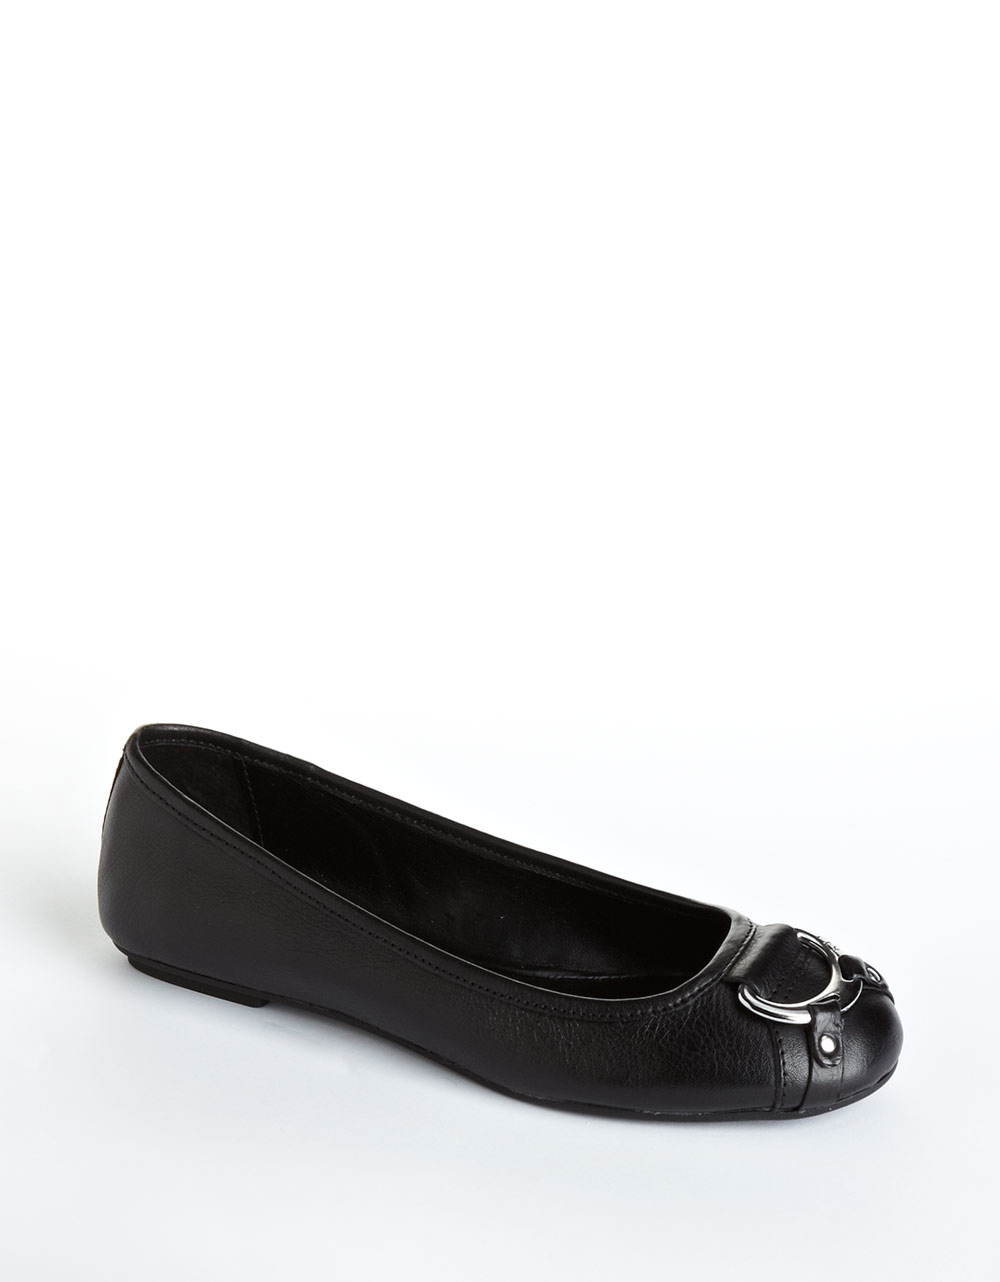 lauren by ralph lauren abigale leather ballet flats in black lyst. Black Bedroom Furniture Sets. Home Design Ideas